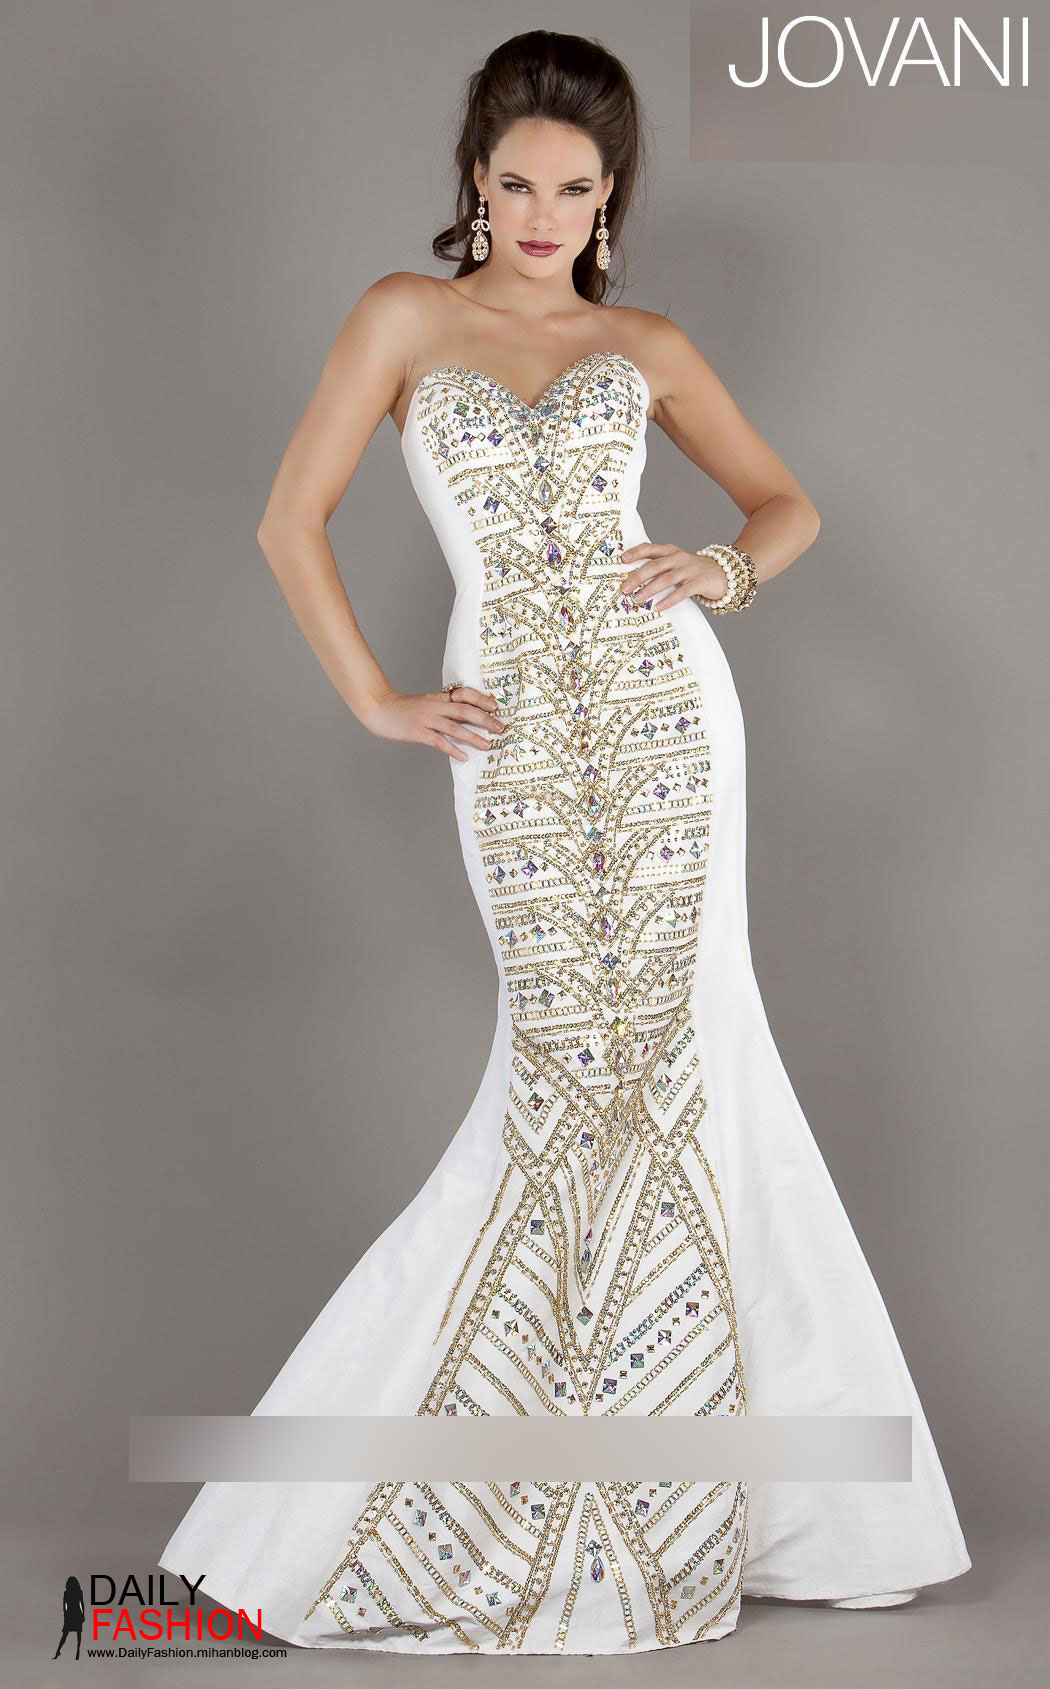 Daily Fashion - مدل لباس شب از طراح آمریکایی Jovani سری 2